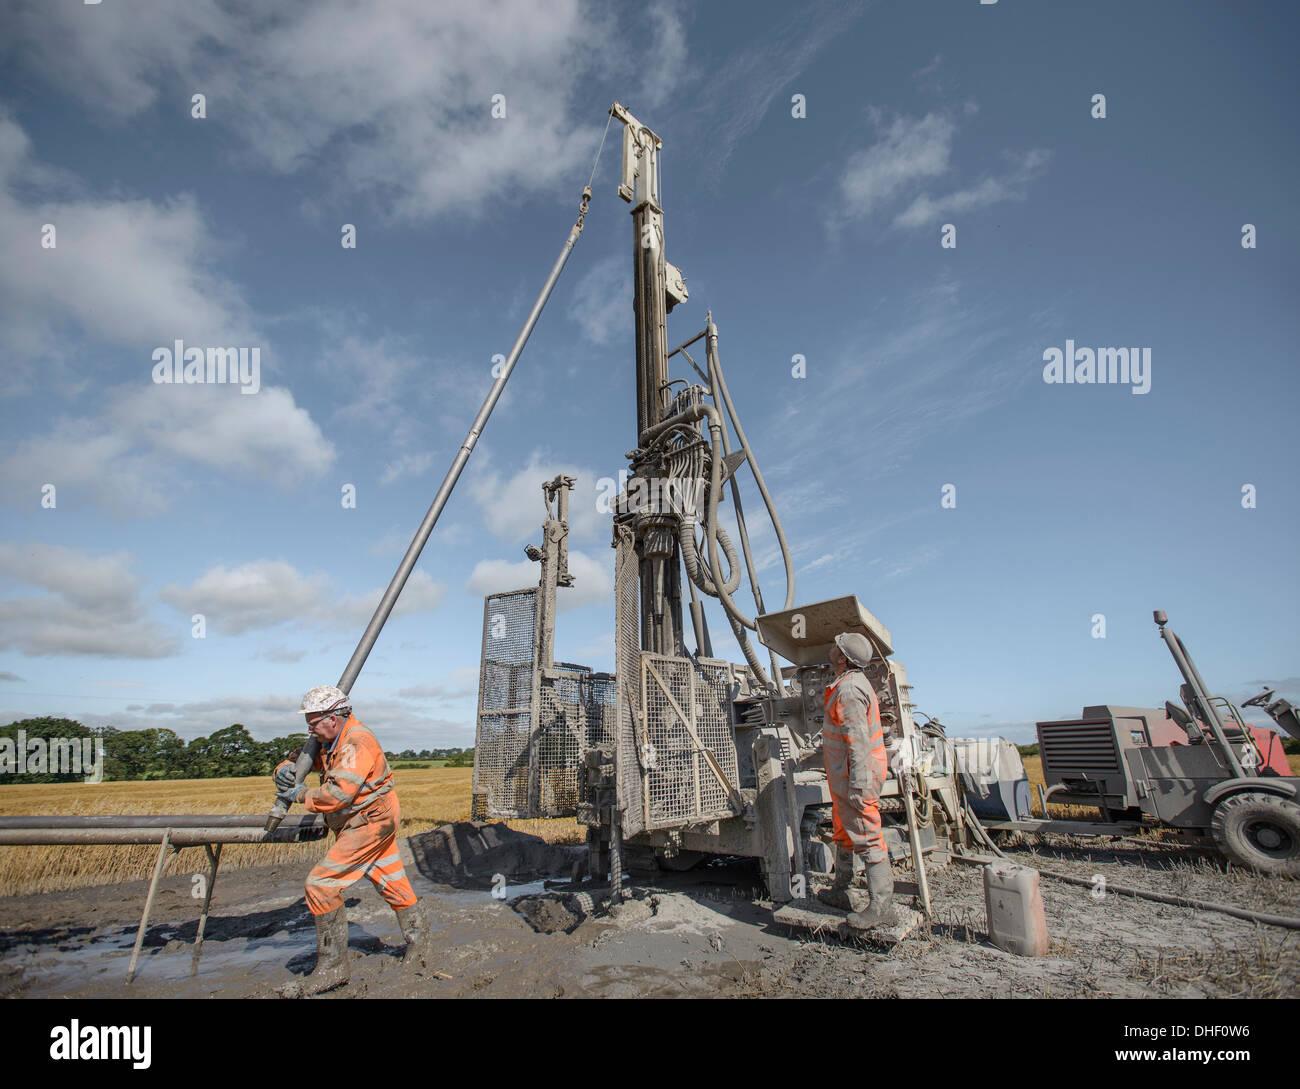 Arbeitnehmer tätig Bohranlage für Kohle im Feld zu erkunden Stockbild